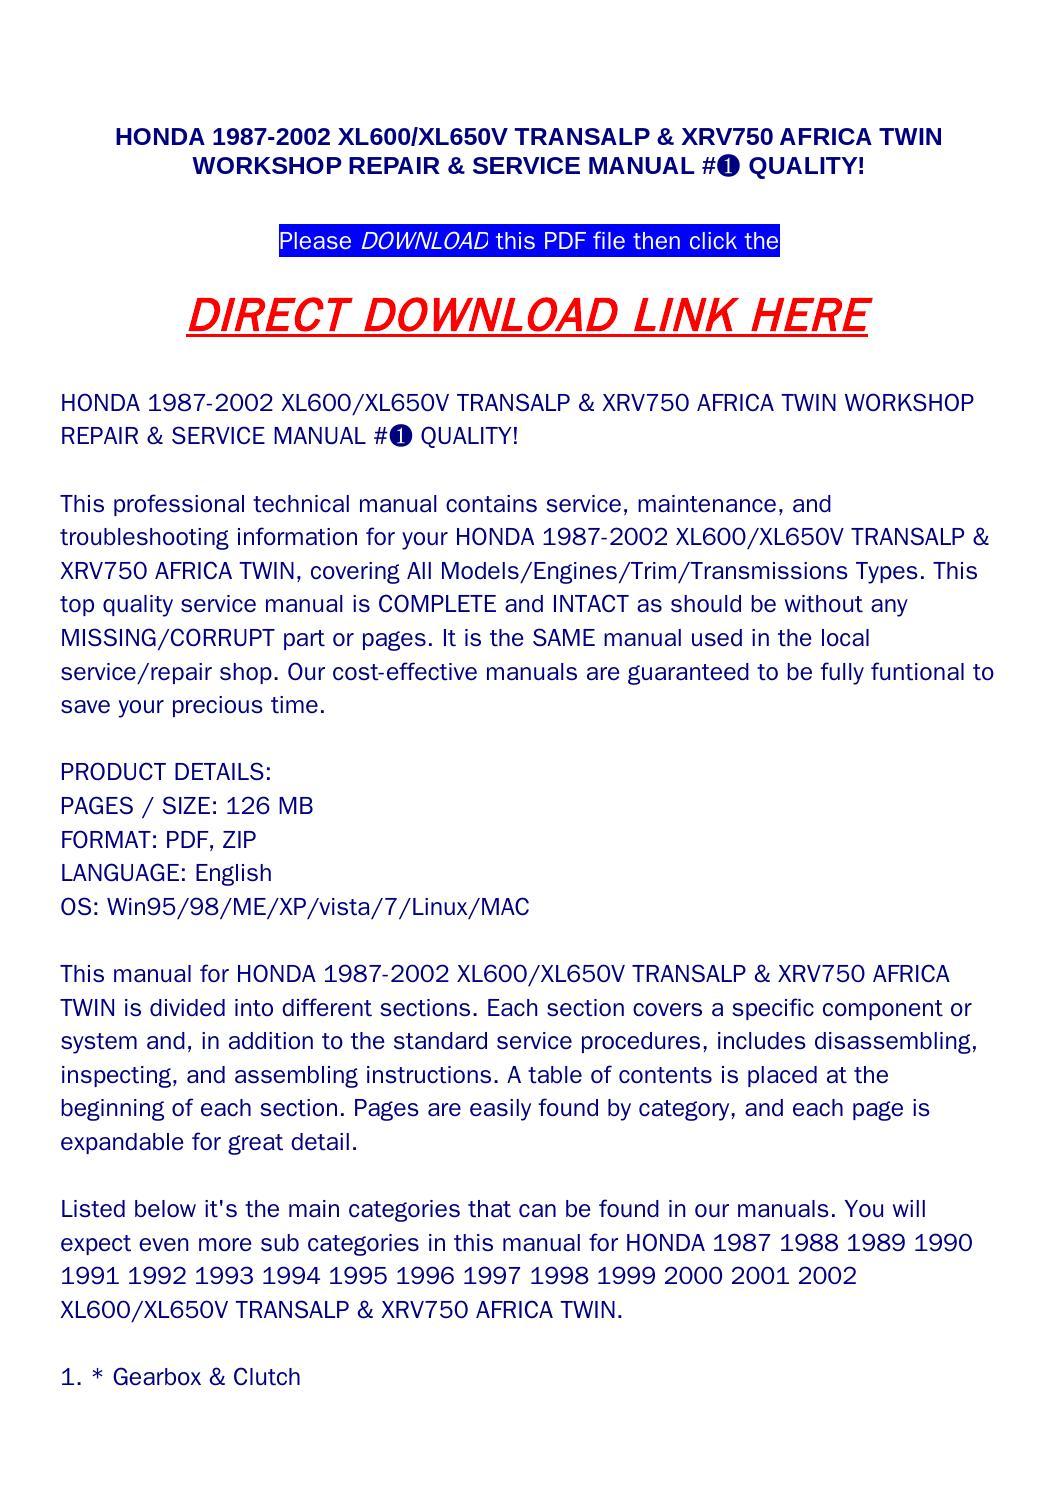 Honda 1987 2002 xl600 xl650v transalp & xrv750 africa twin workshop on